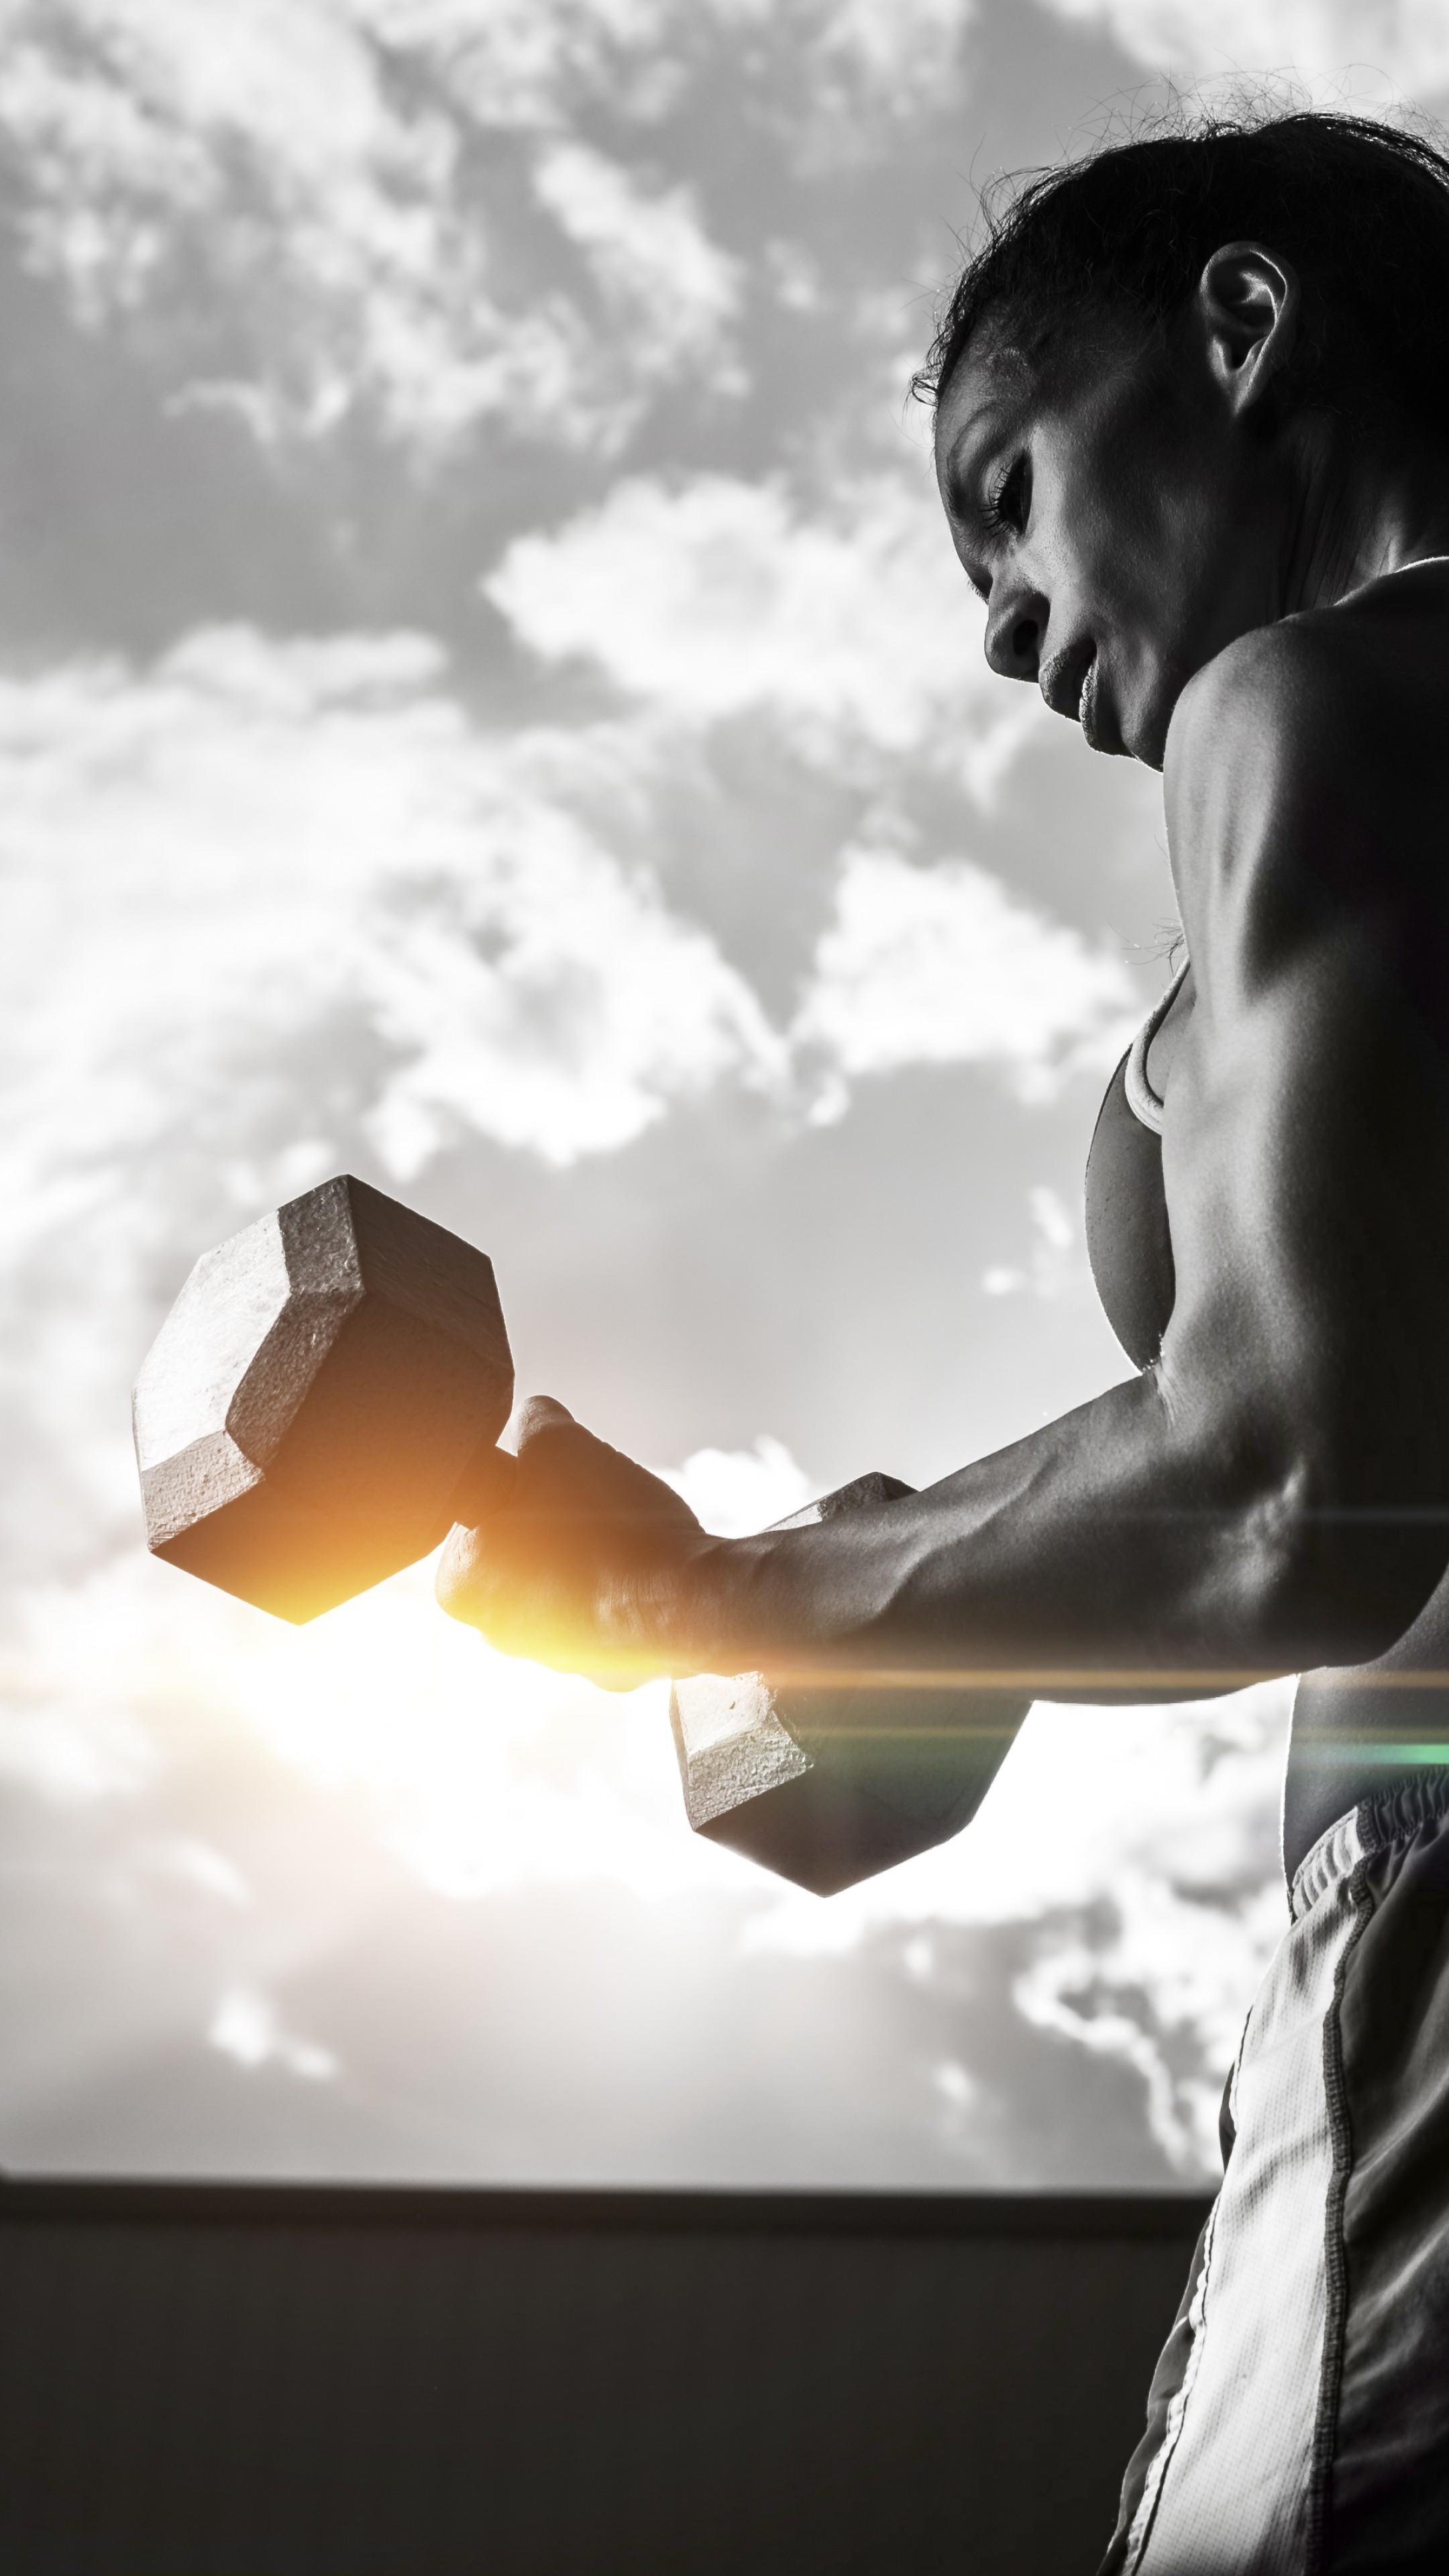 Wallpaper Girl Fitness Exercise Gym Dumbbells Workout